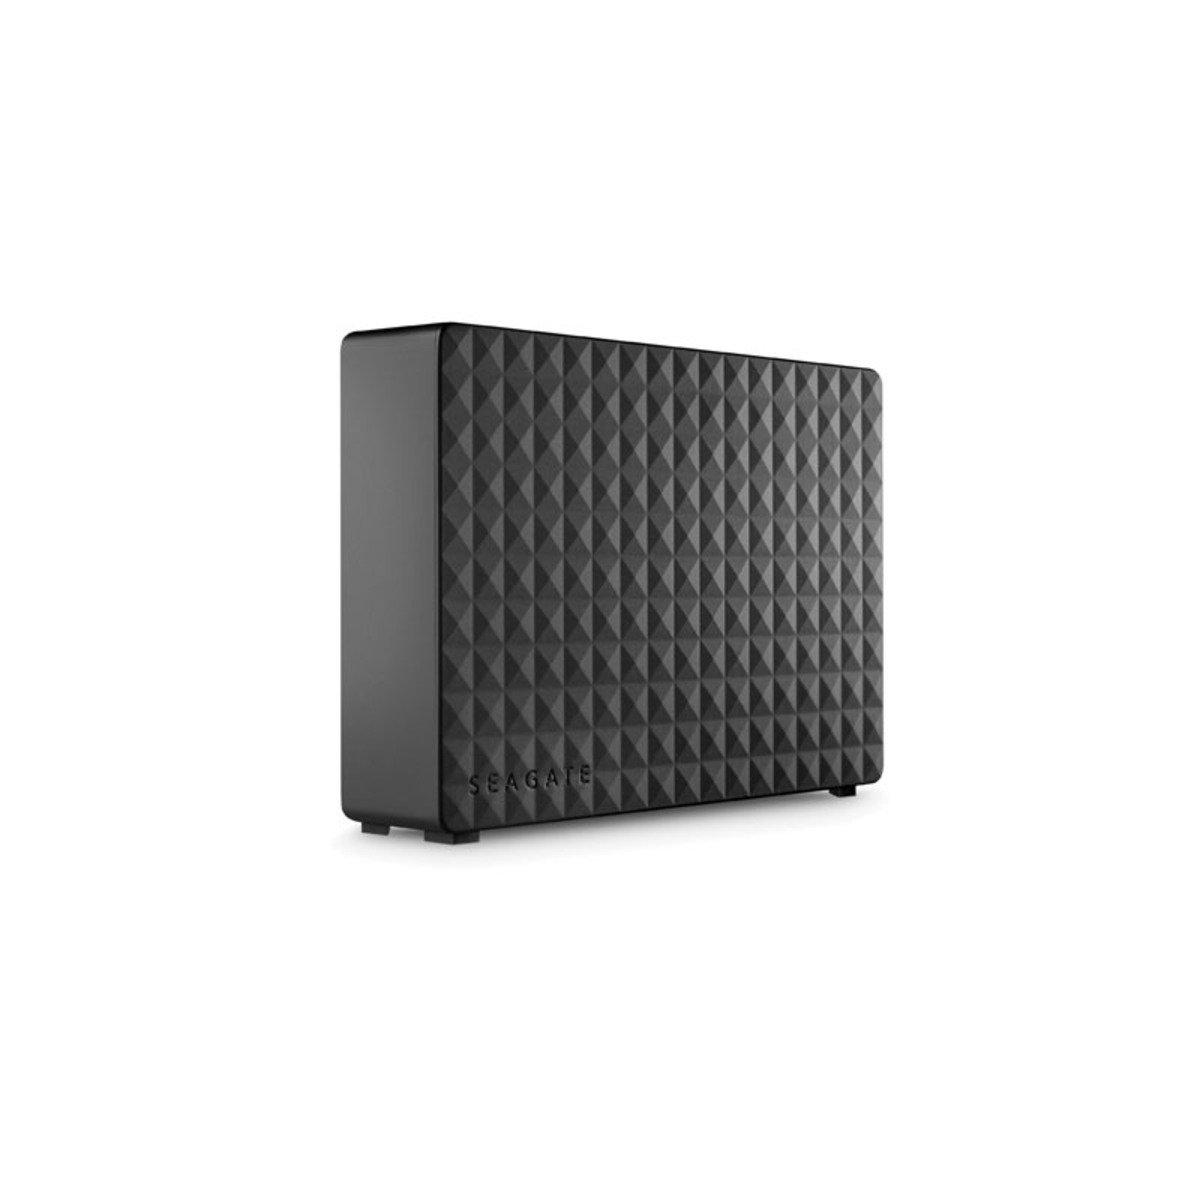 Expansion 4TB USB 3.0 3.5吋 外置硬碟 STEB4000300